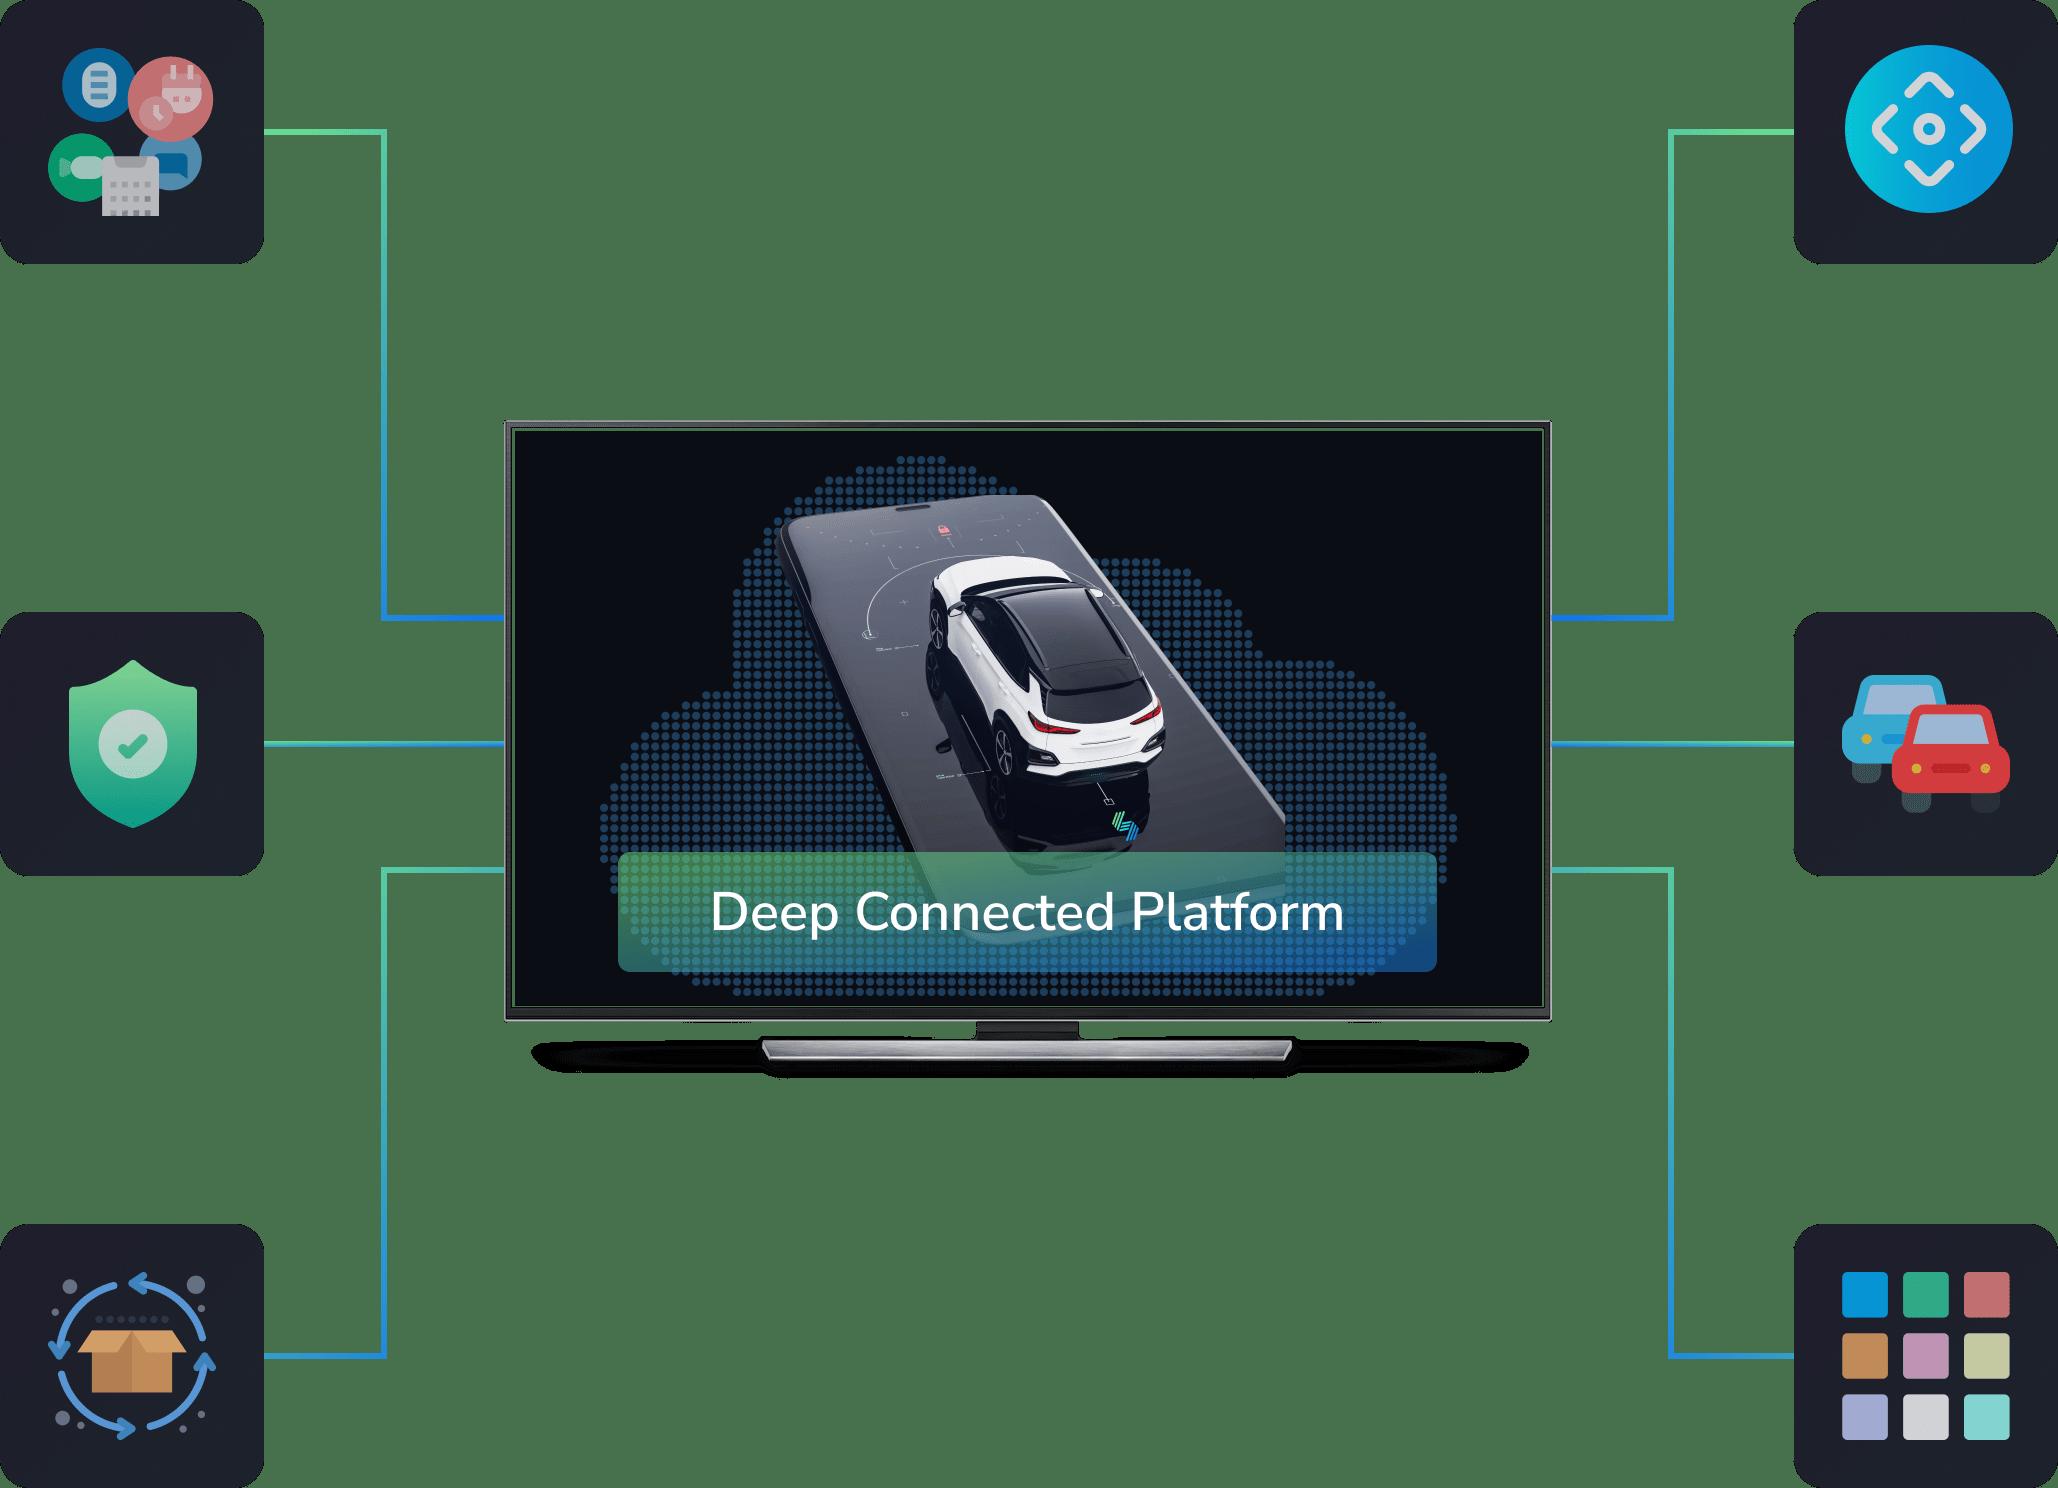 Sibros Deep Connected Platform explainer image